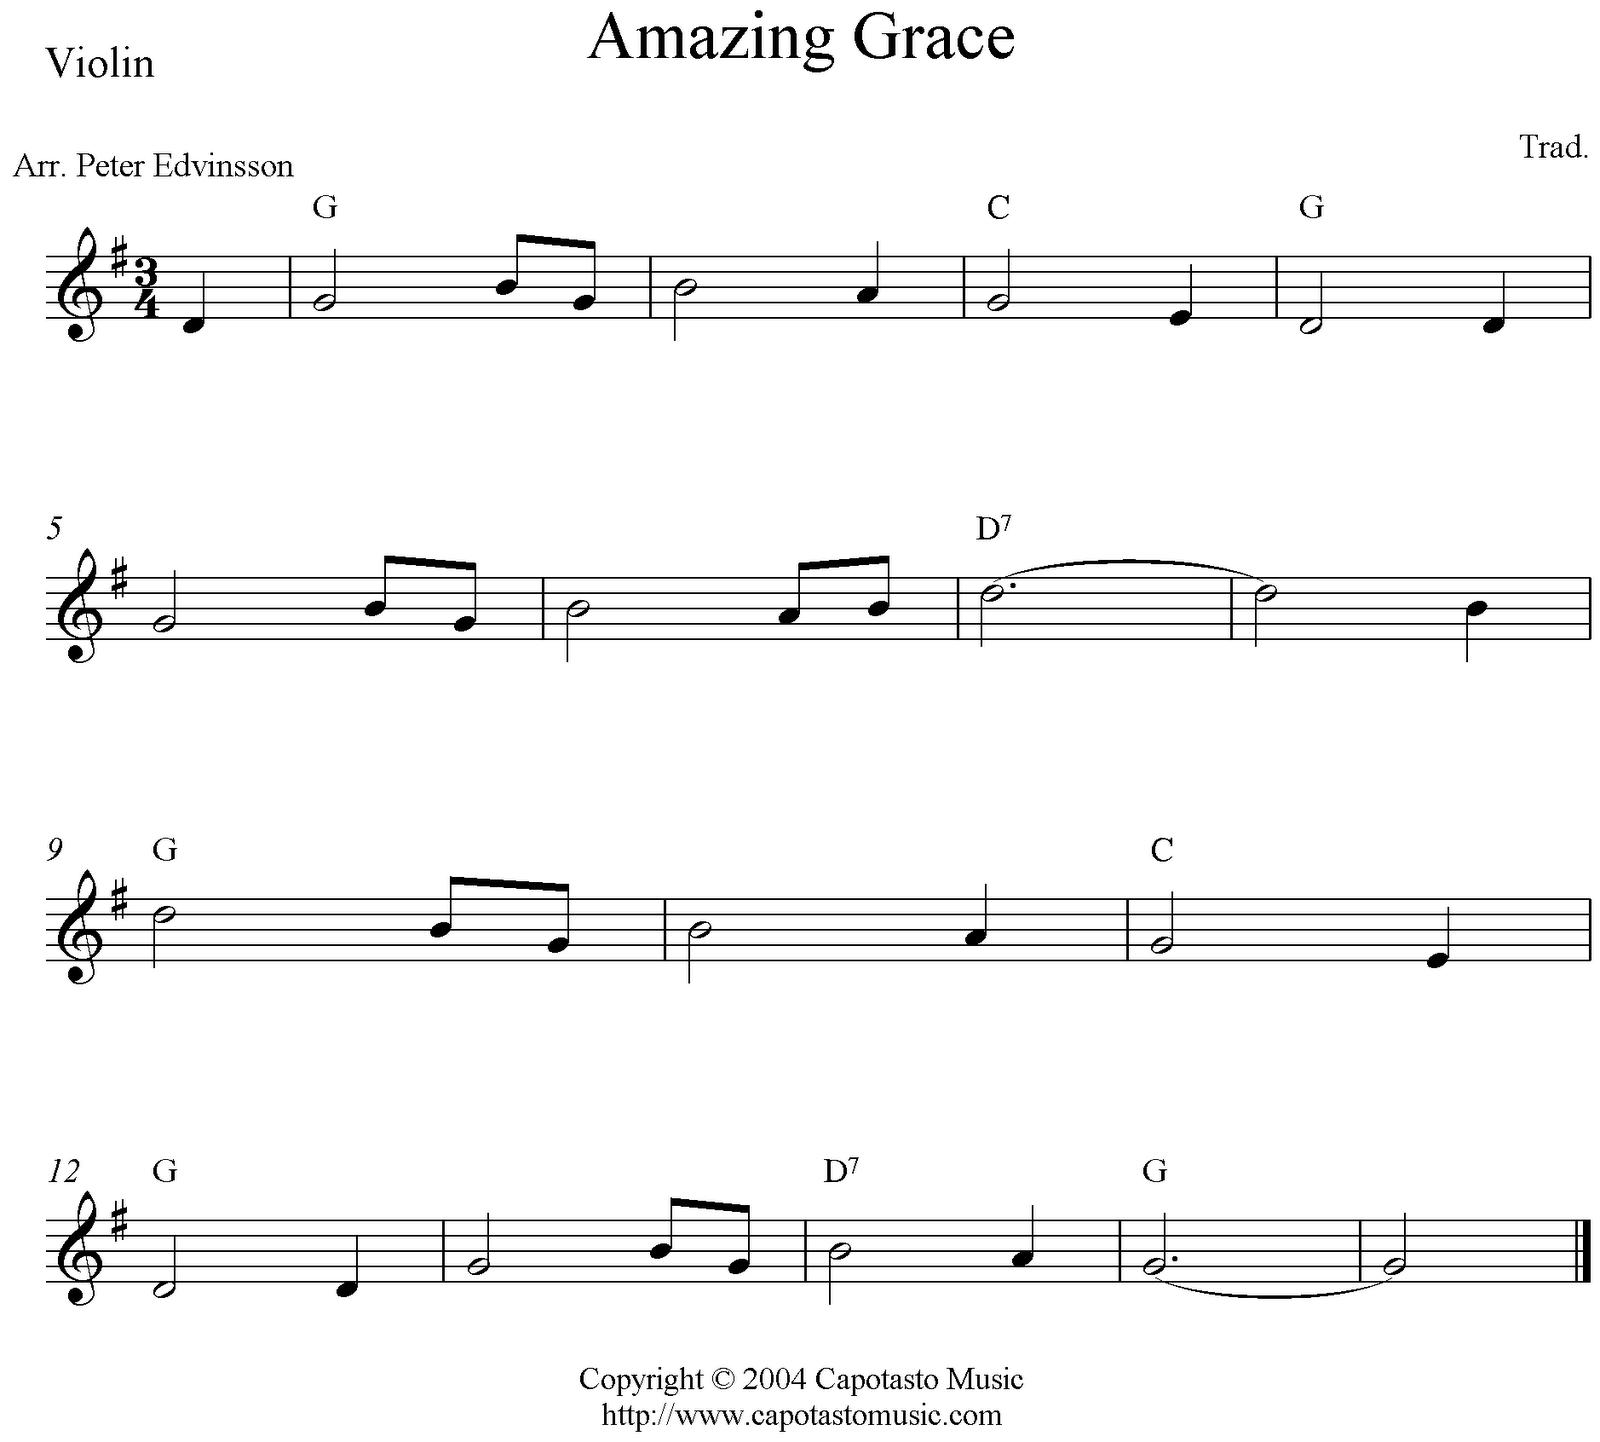 Amazing Grace Sheet Music For Guitar